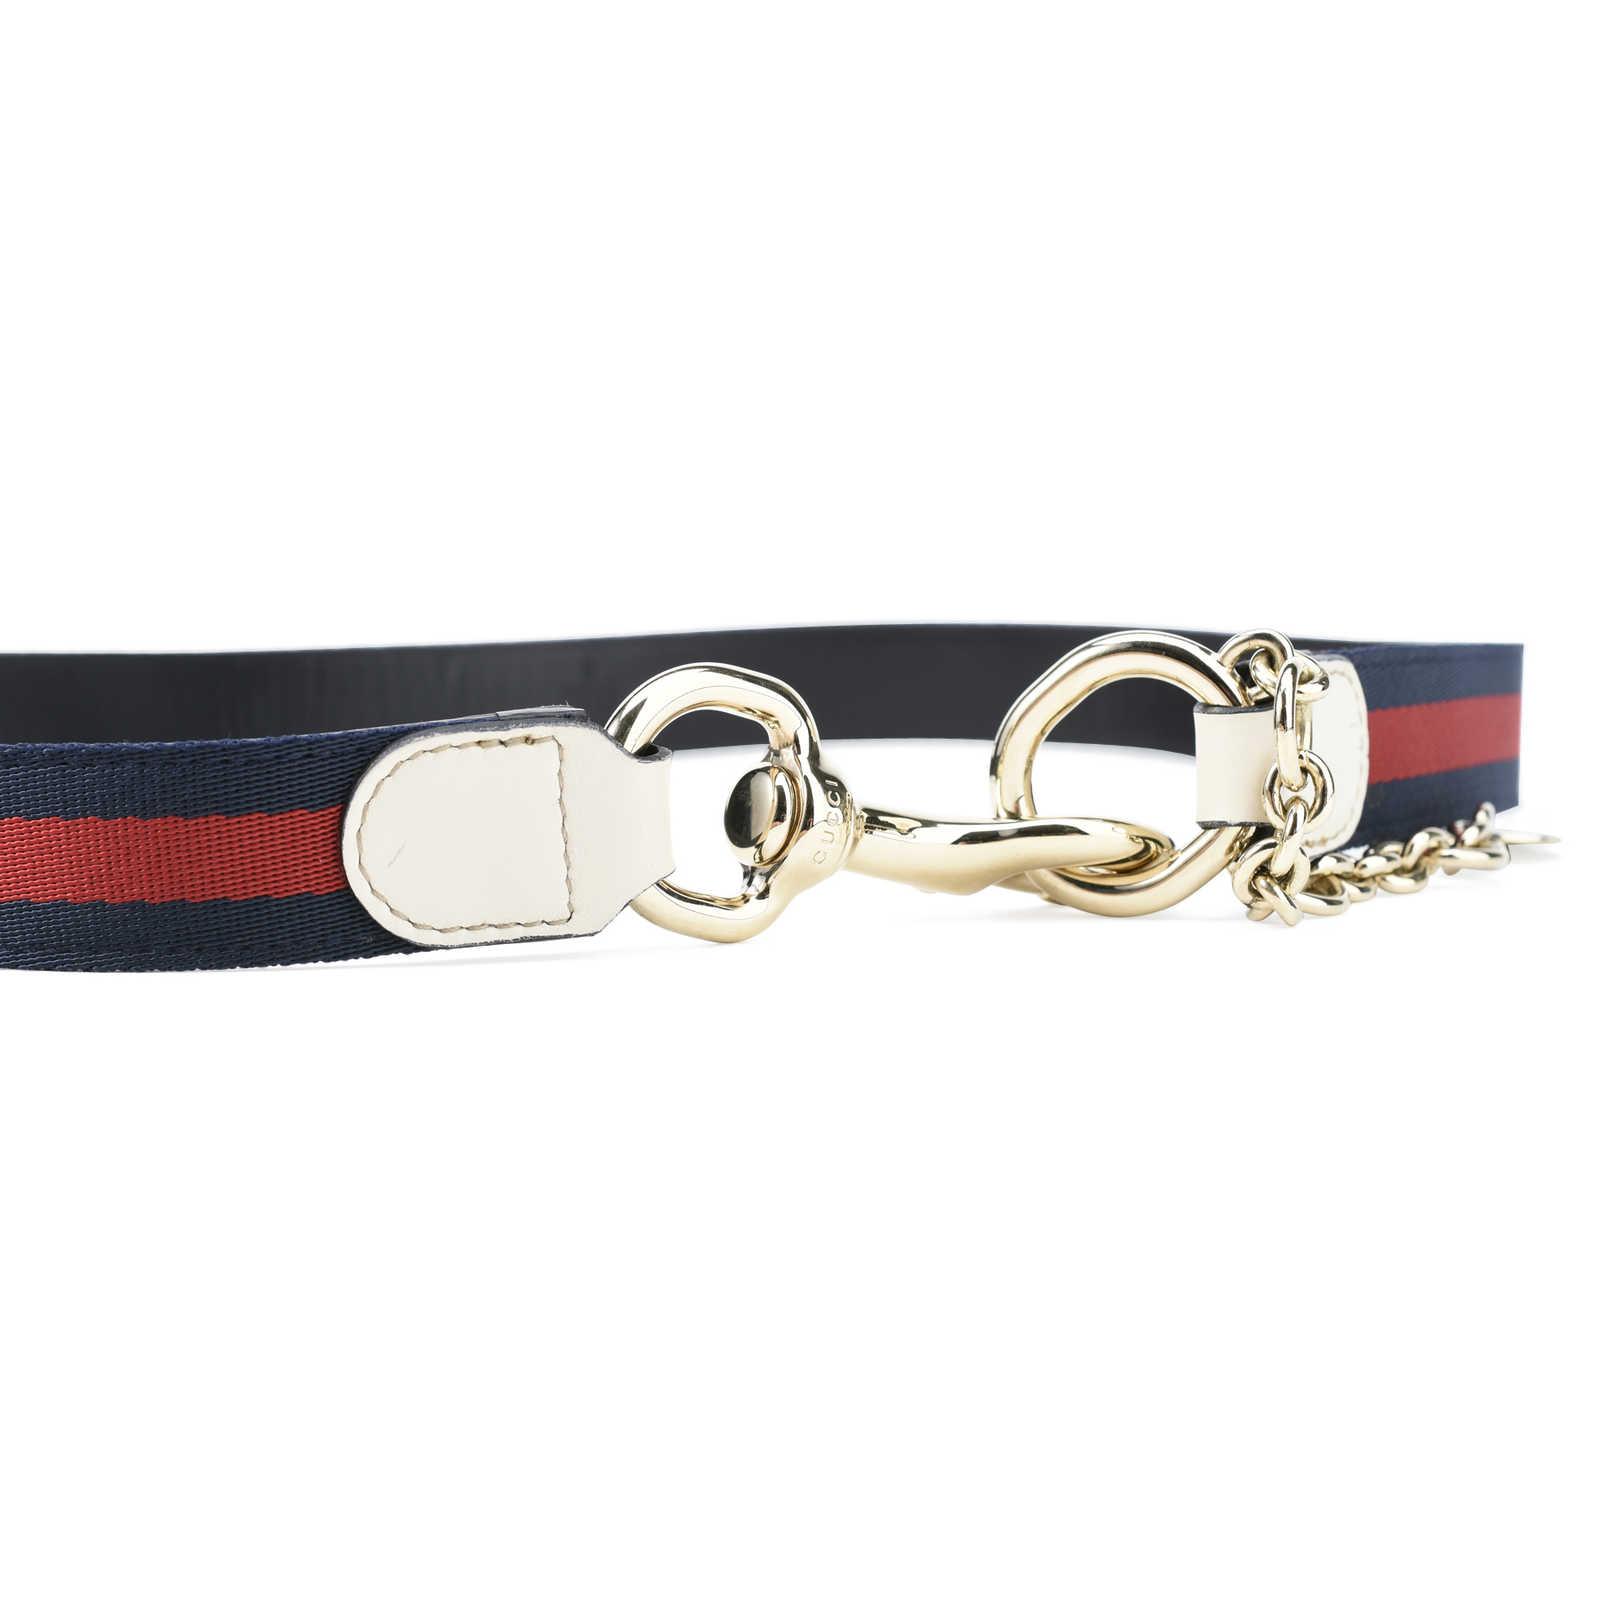 c998949de ... Authentic Second Hand Gucci Horsebit Hook Buckle Belt (PSS-200-00948)  ...